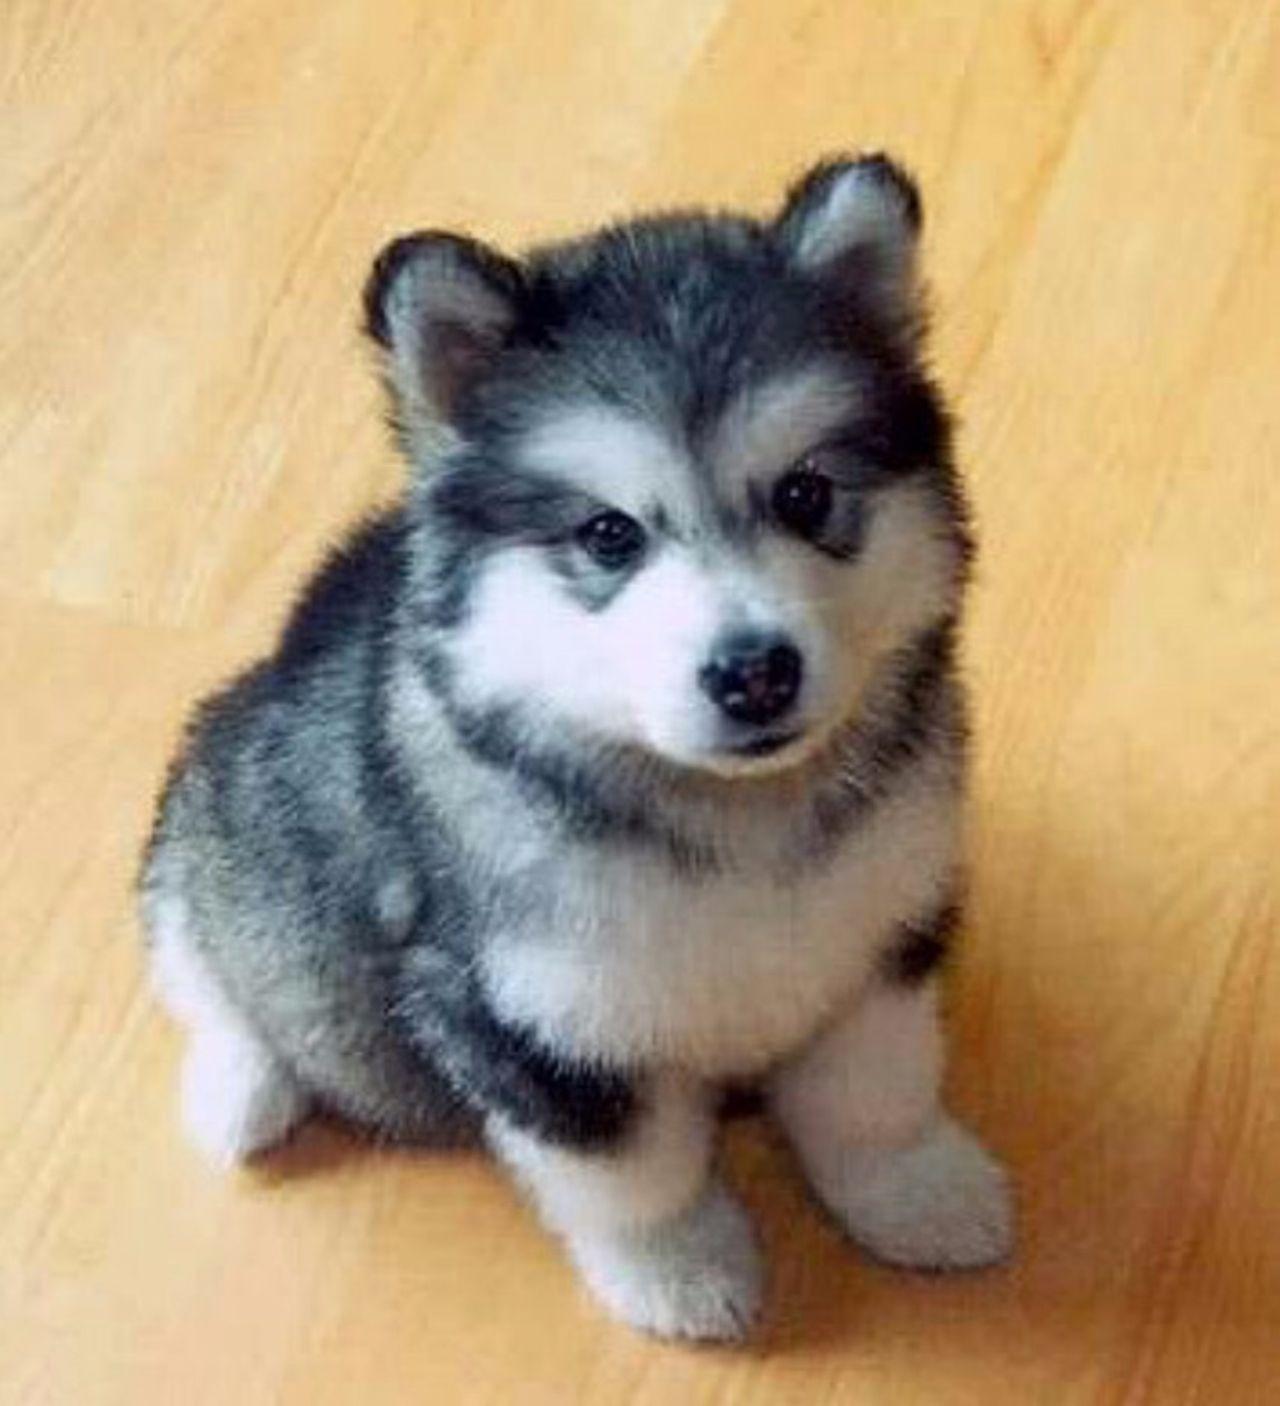 Corgi Husky Mix Puppies For Sale In Missouri Google Search Dog Crossbreeds Corgi Husky Mix Mixed Breed Dogs